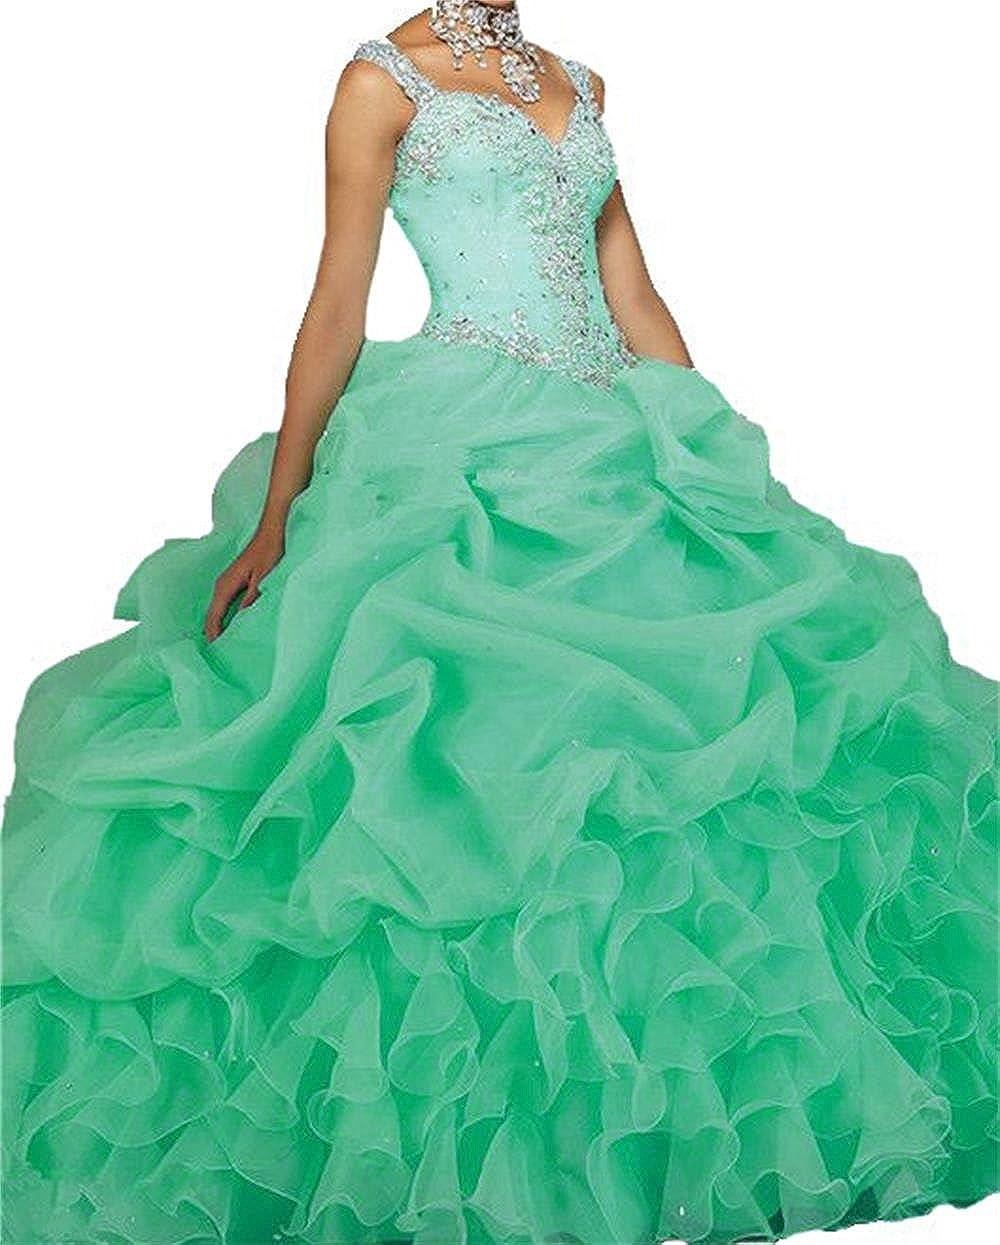 Amazon.com: Dydsz Women\'s Quinceanera Dresses 2019 Ball Gown Sweet ...